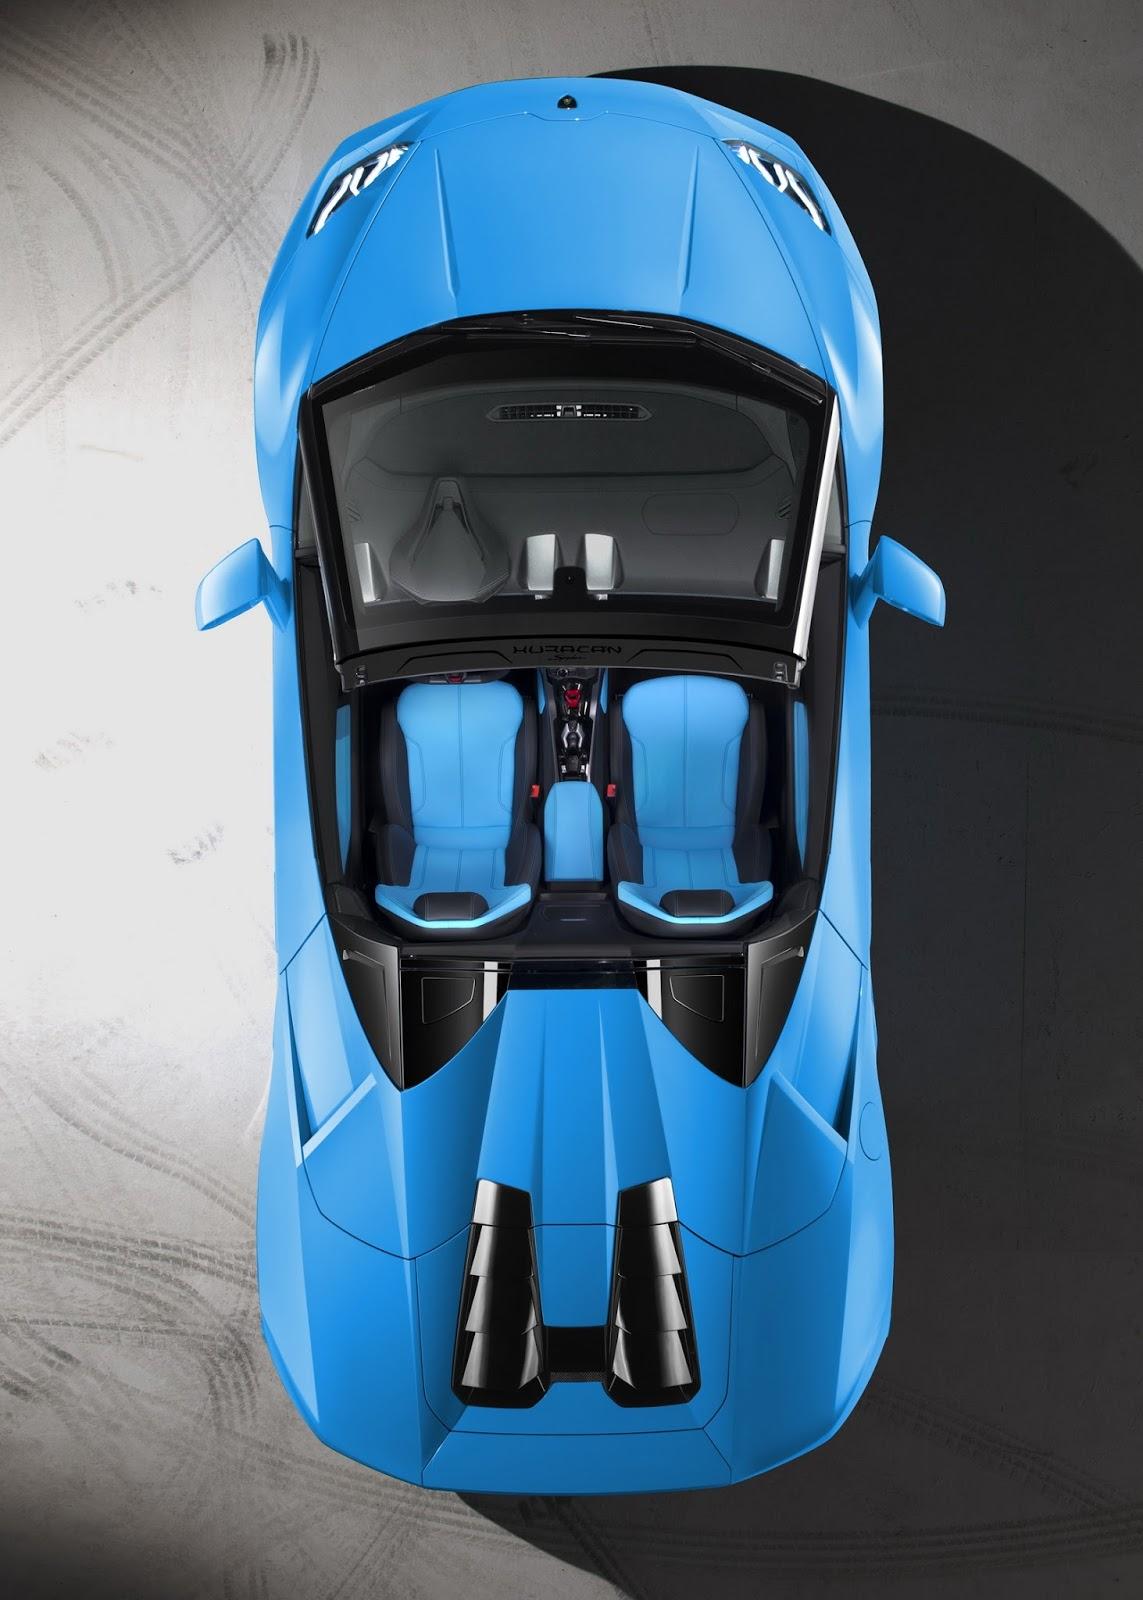 Lamborghini-huracan-spyder-lp-610-4-7